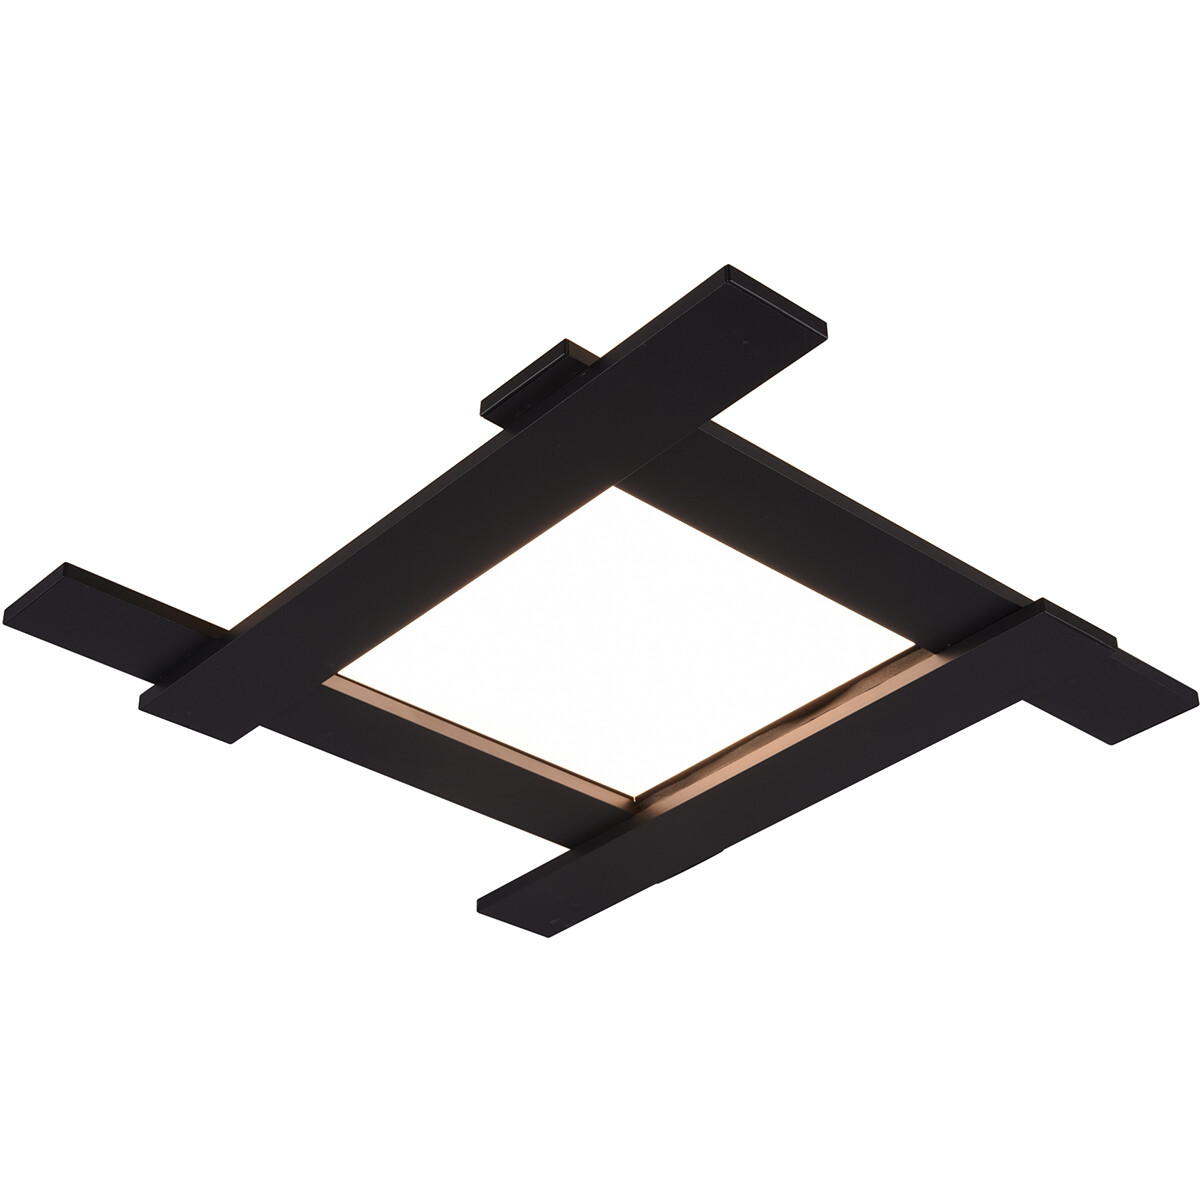 LED Plafondlamp - Plafondverlichting - Trion Balfy - 20W - Warm Wit 3000K - Vierkant - Mat Zwart - A